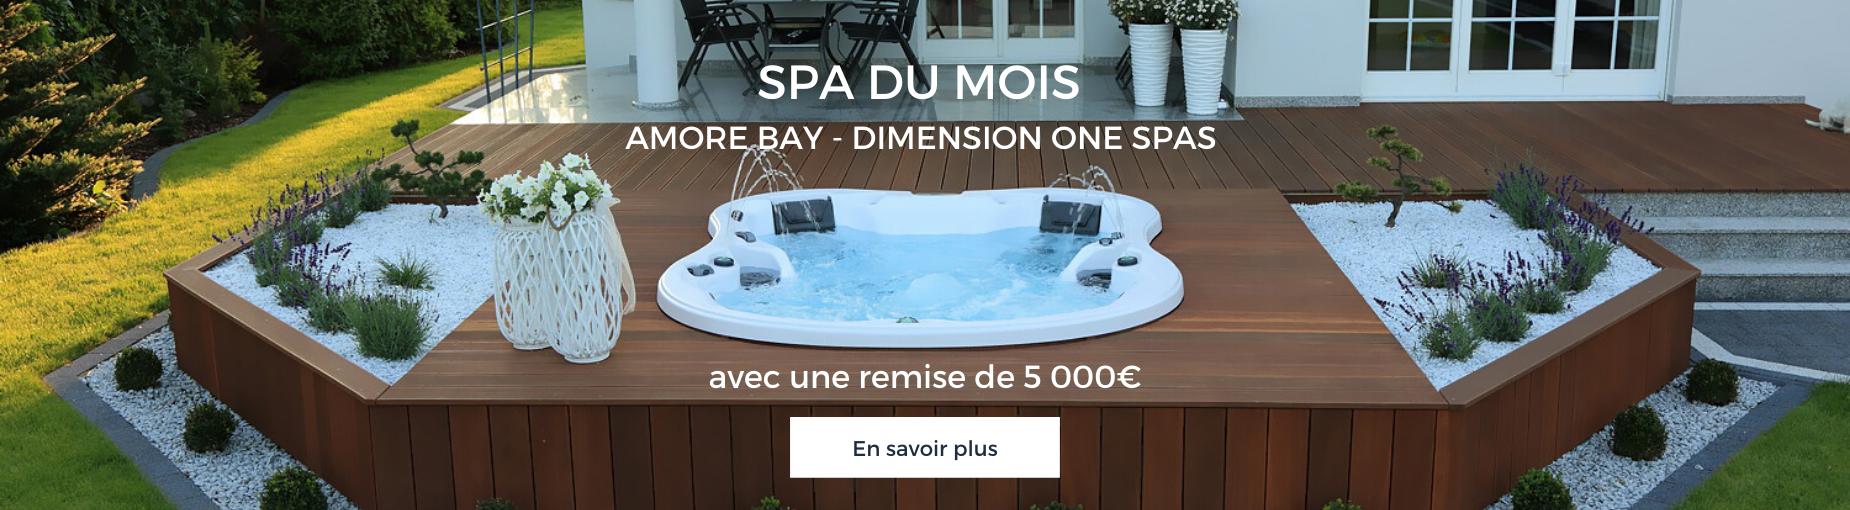 amore bay spa du mois